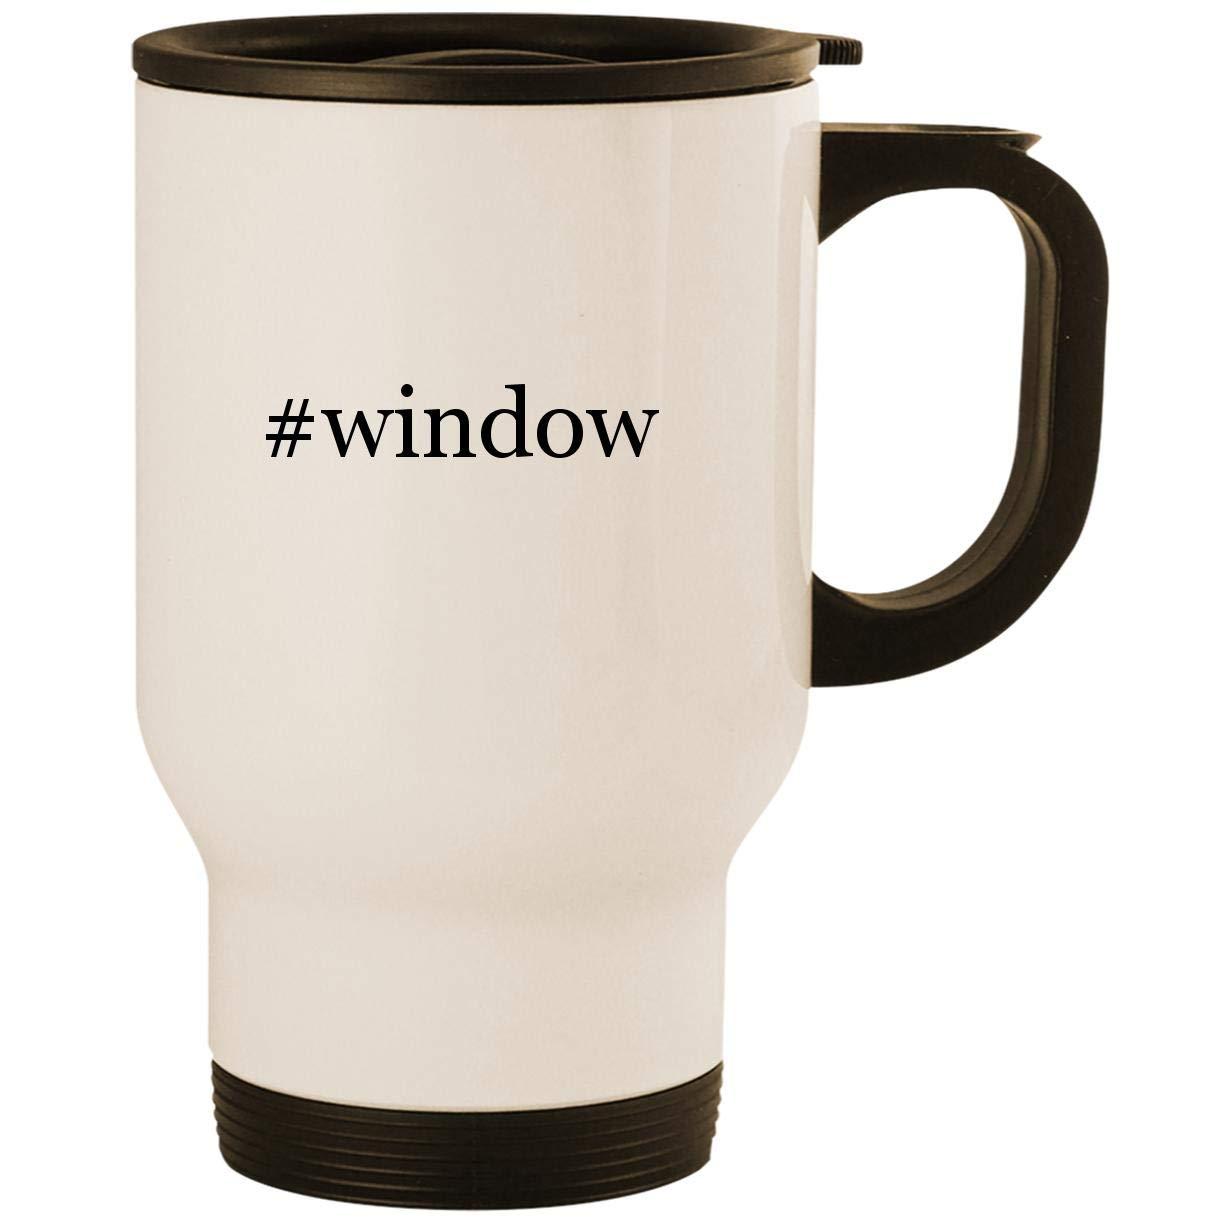 #window - Stainless Steel 14oz Road Ready Travel Mug, White